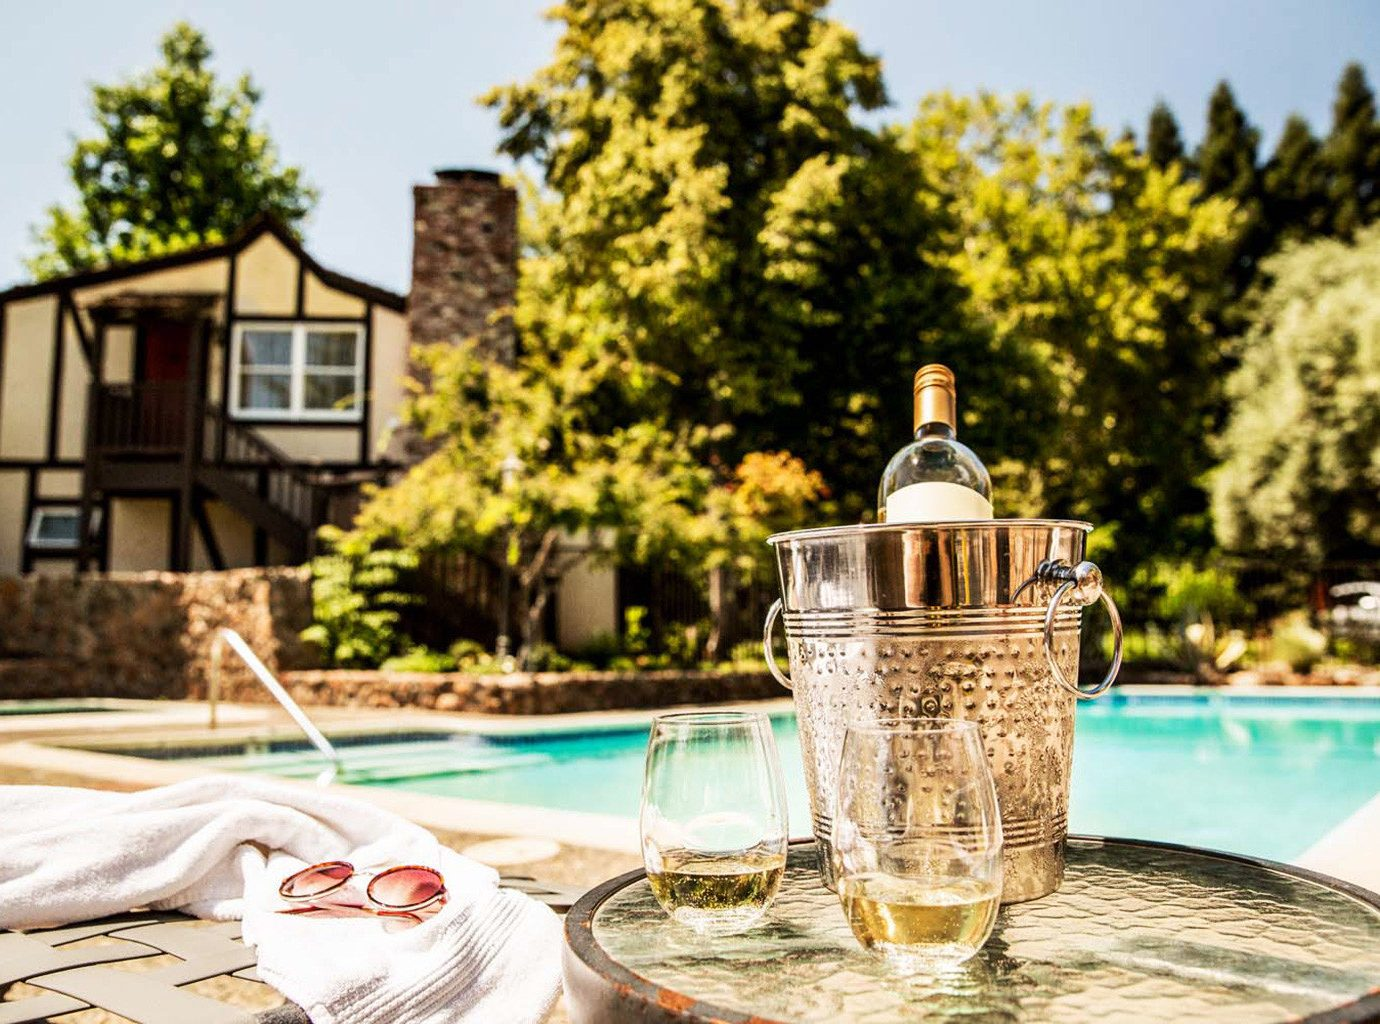 Drink Exterior Inn Patio Pool Romantic tree table home estate lighting meal restaurant cottage backyard